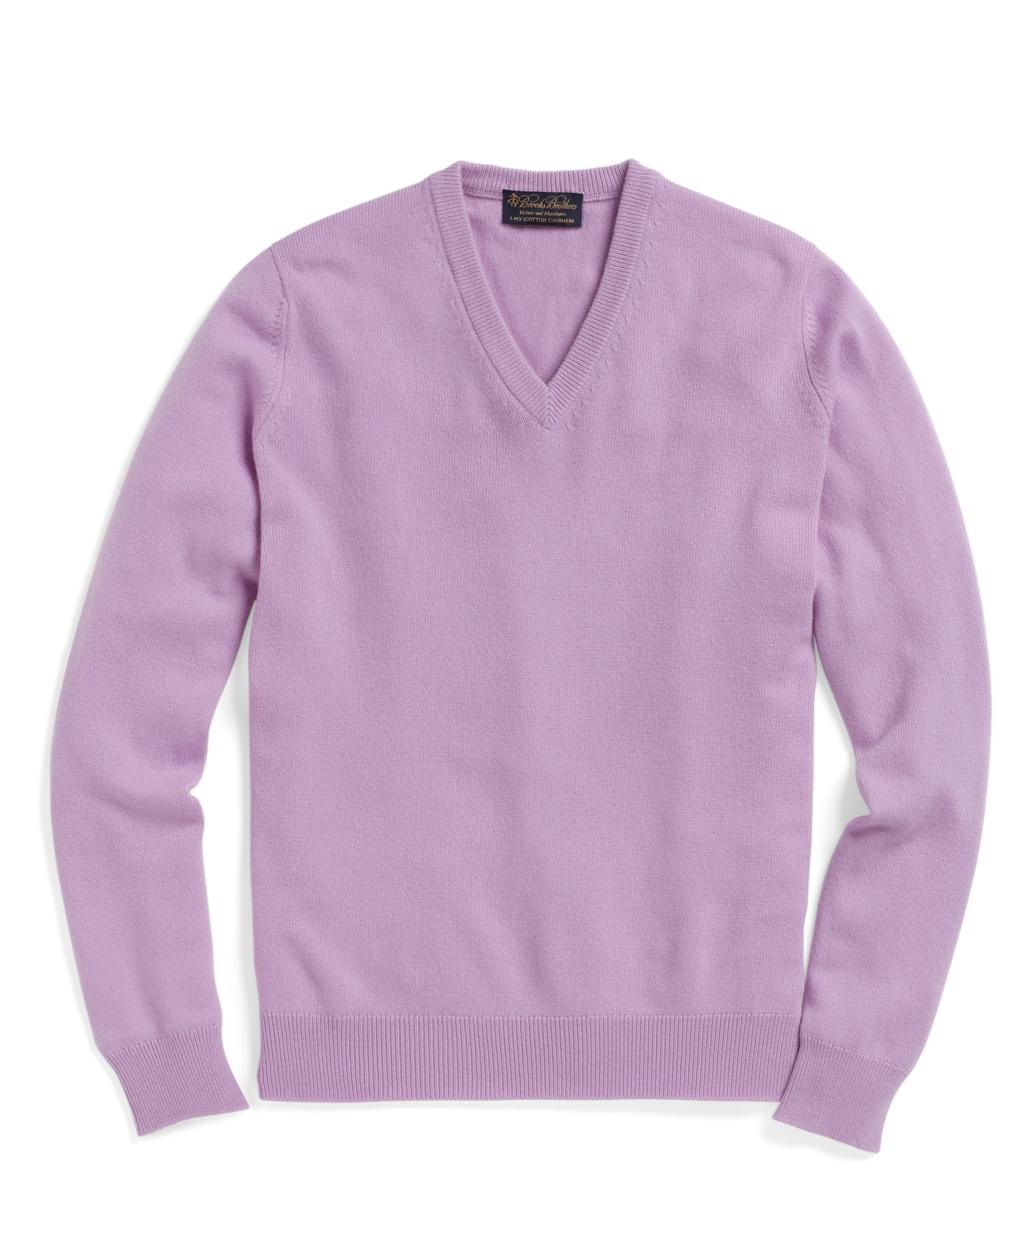 Mens Lavender Cashmere Sweater